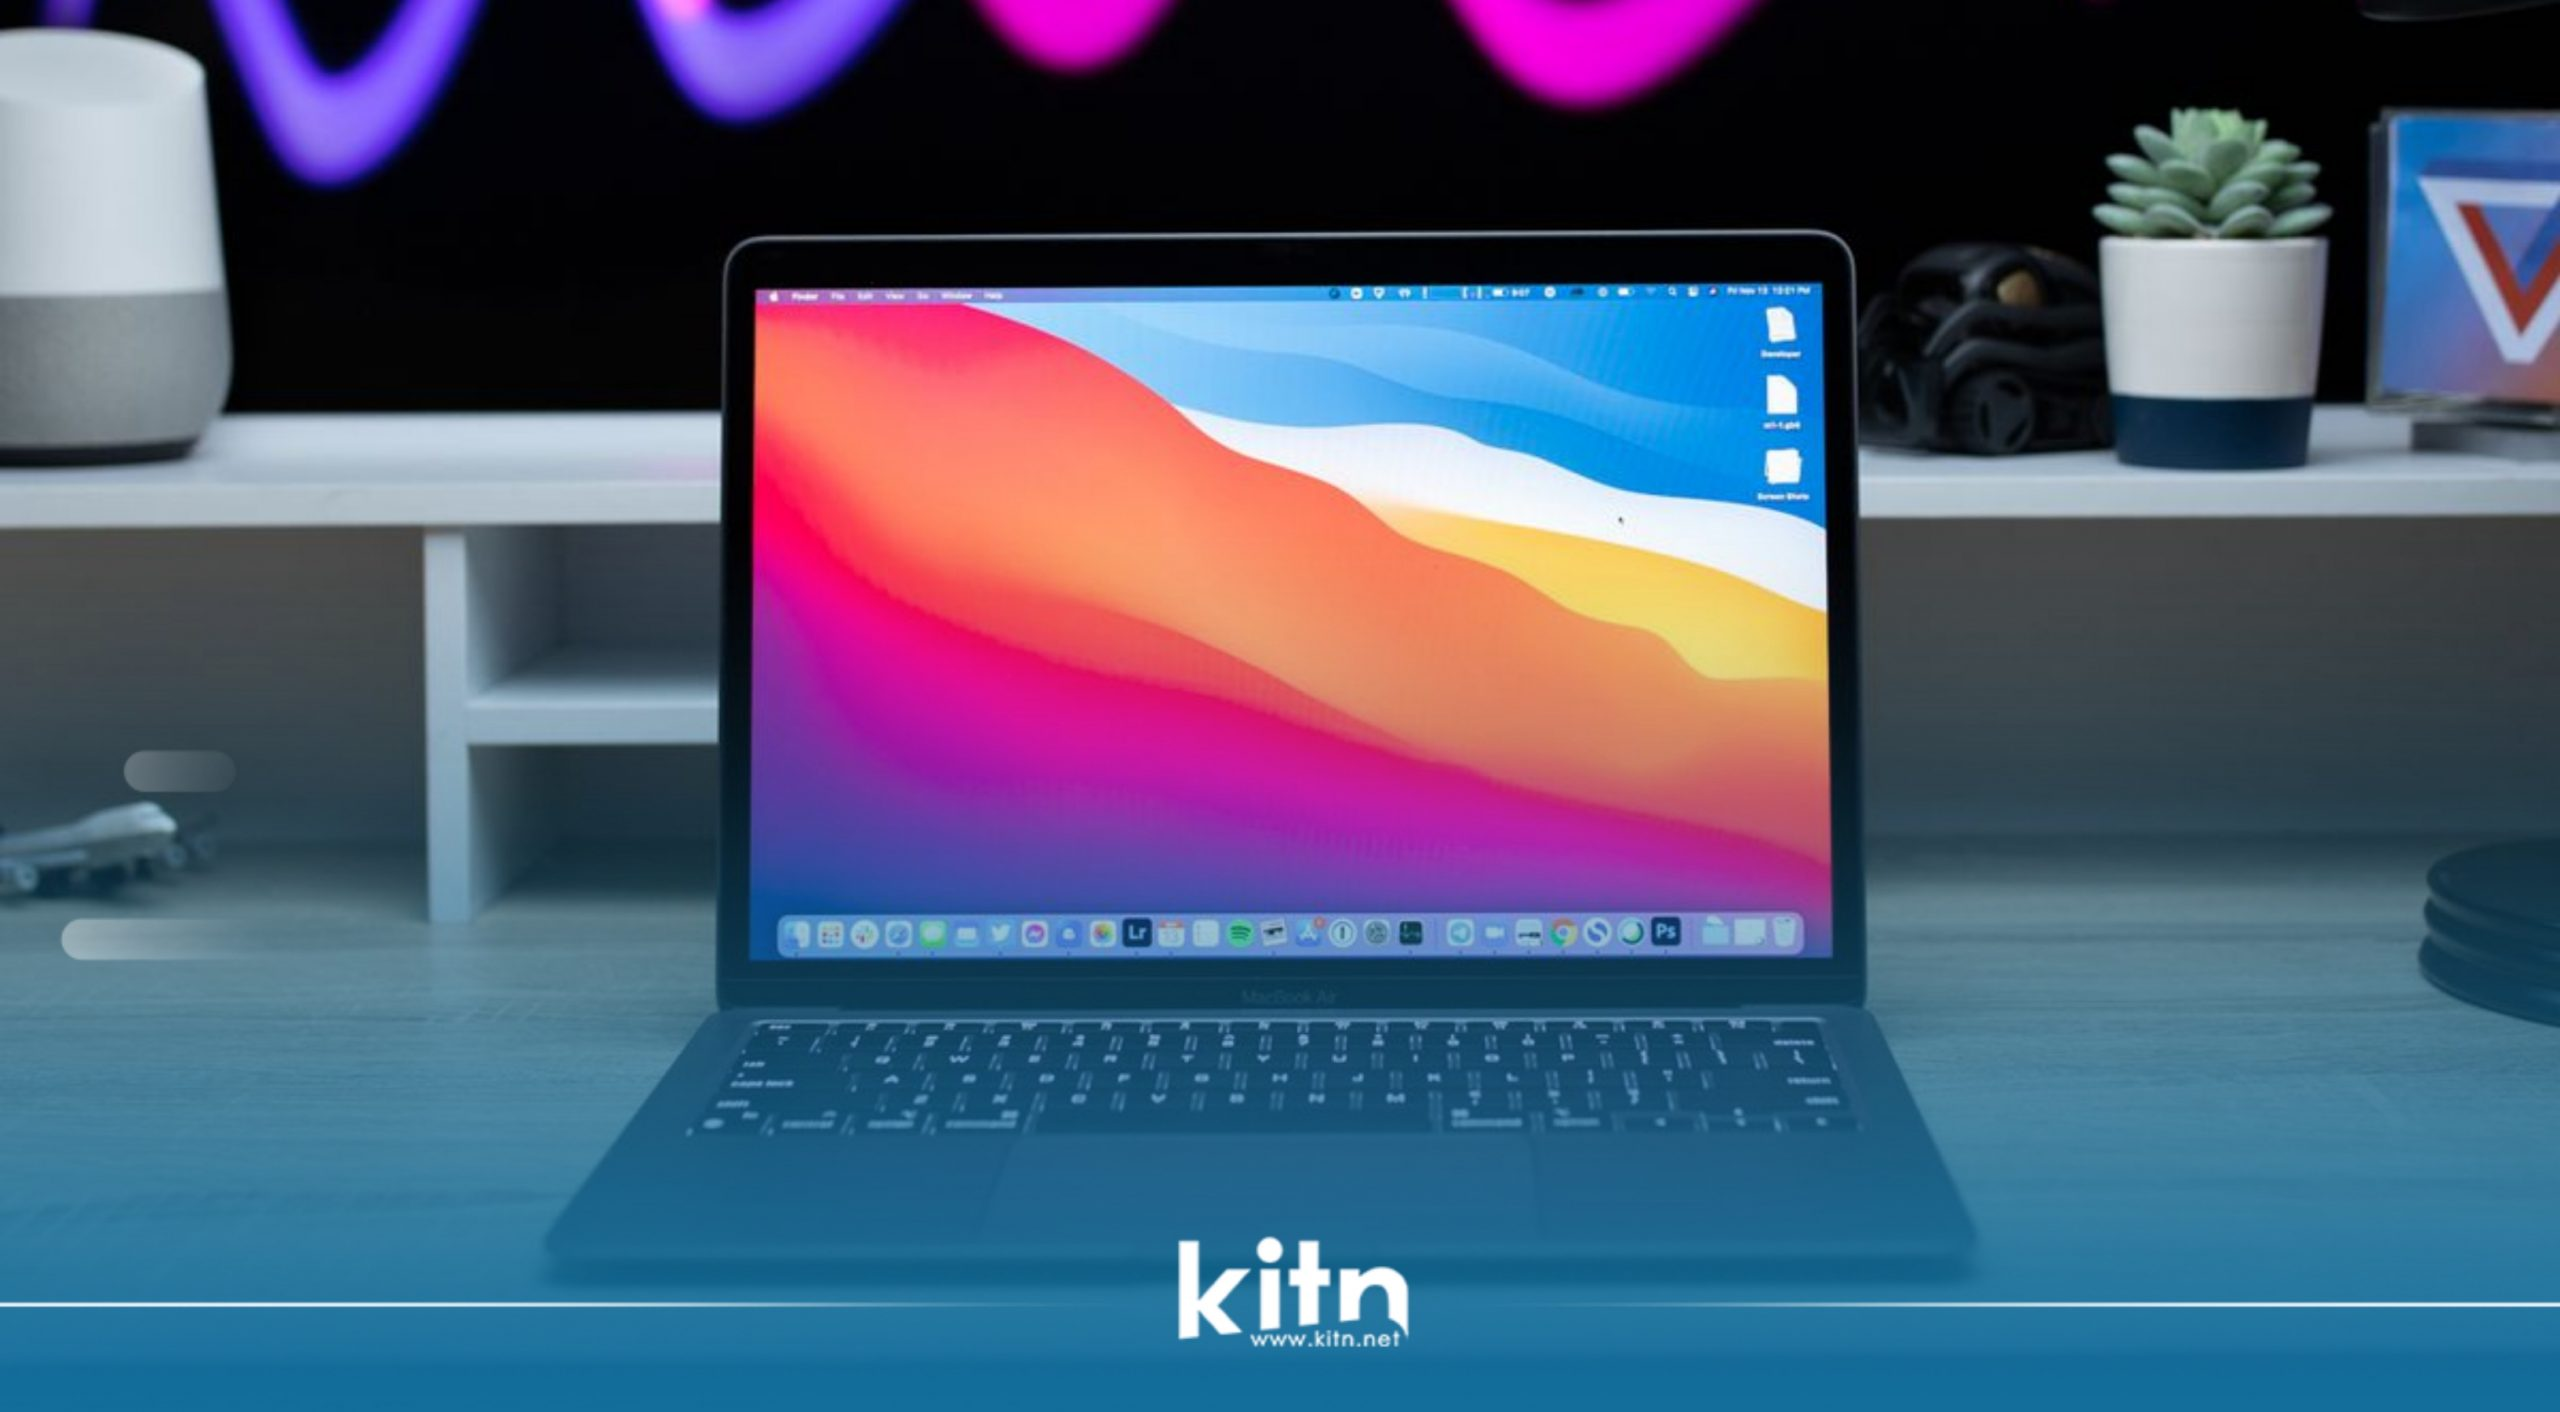 هێشتان ئەپی Box Drive لەسەر وەشانی macOS و ئەو ماکانەی چیپسێتی Apple M1 لەسەر جێگیر کراوە باش کار ناکات